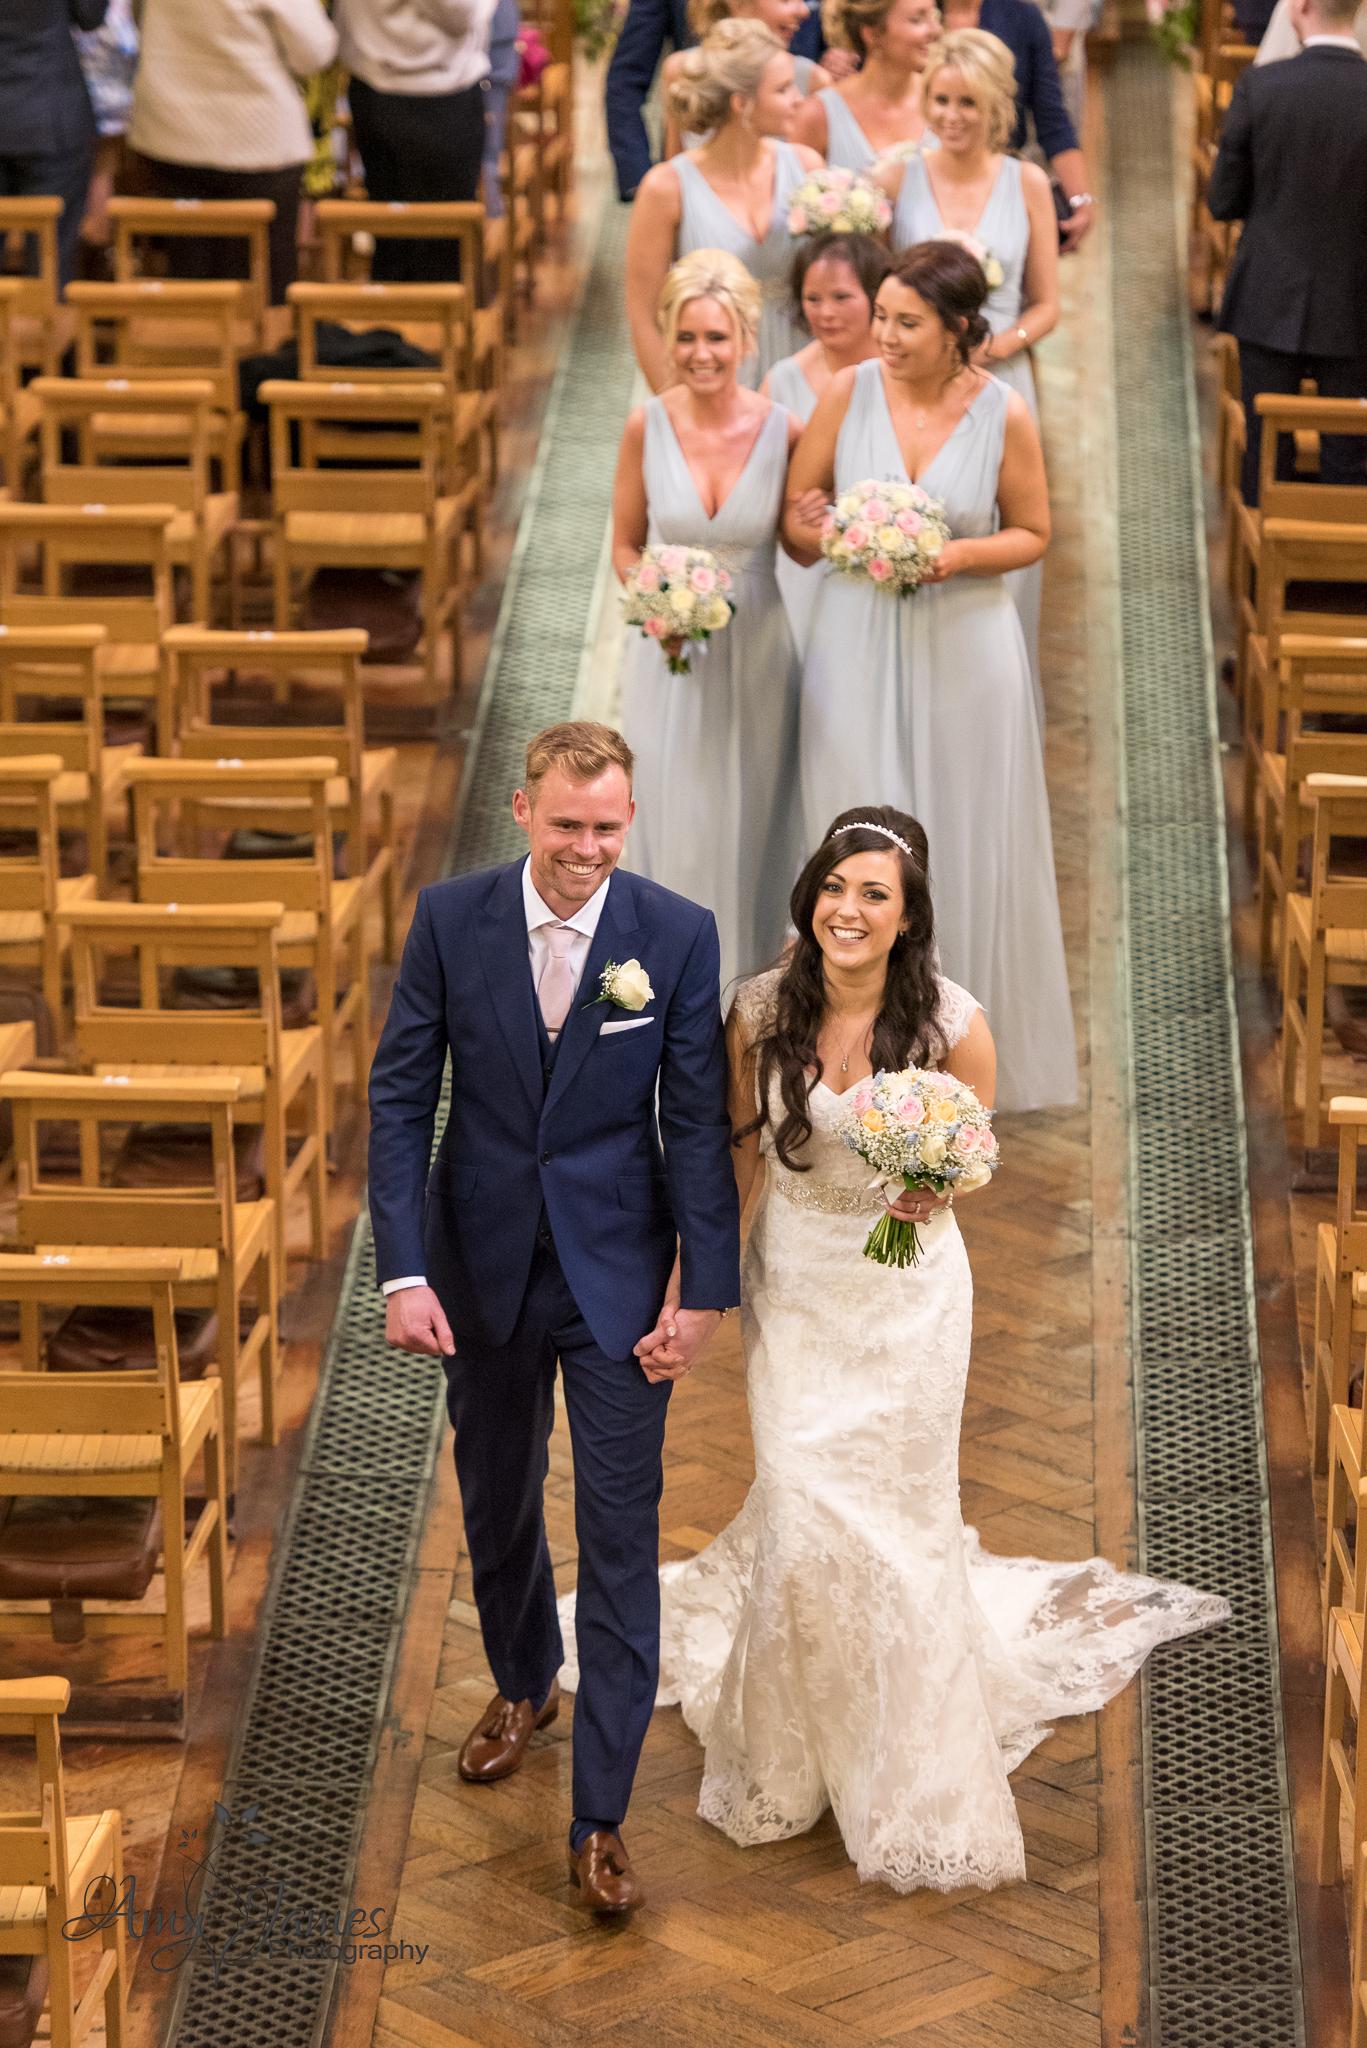 Hampshire wedding photographer // Fleet wedding photographer // Aldershot Garrison Wedding // Warbrook House wedding photographer